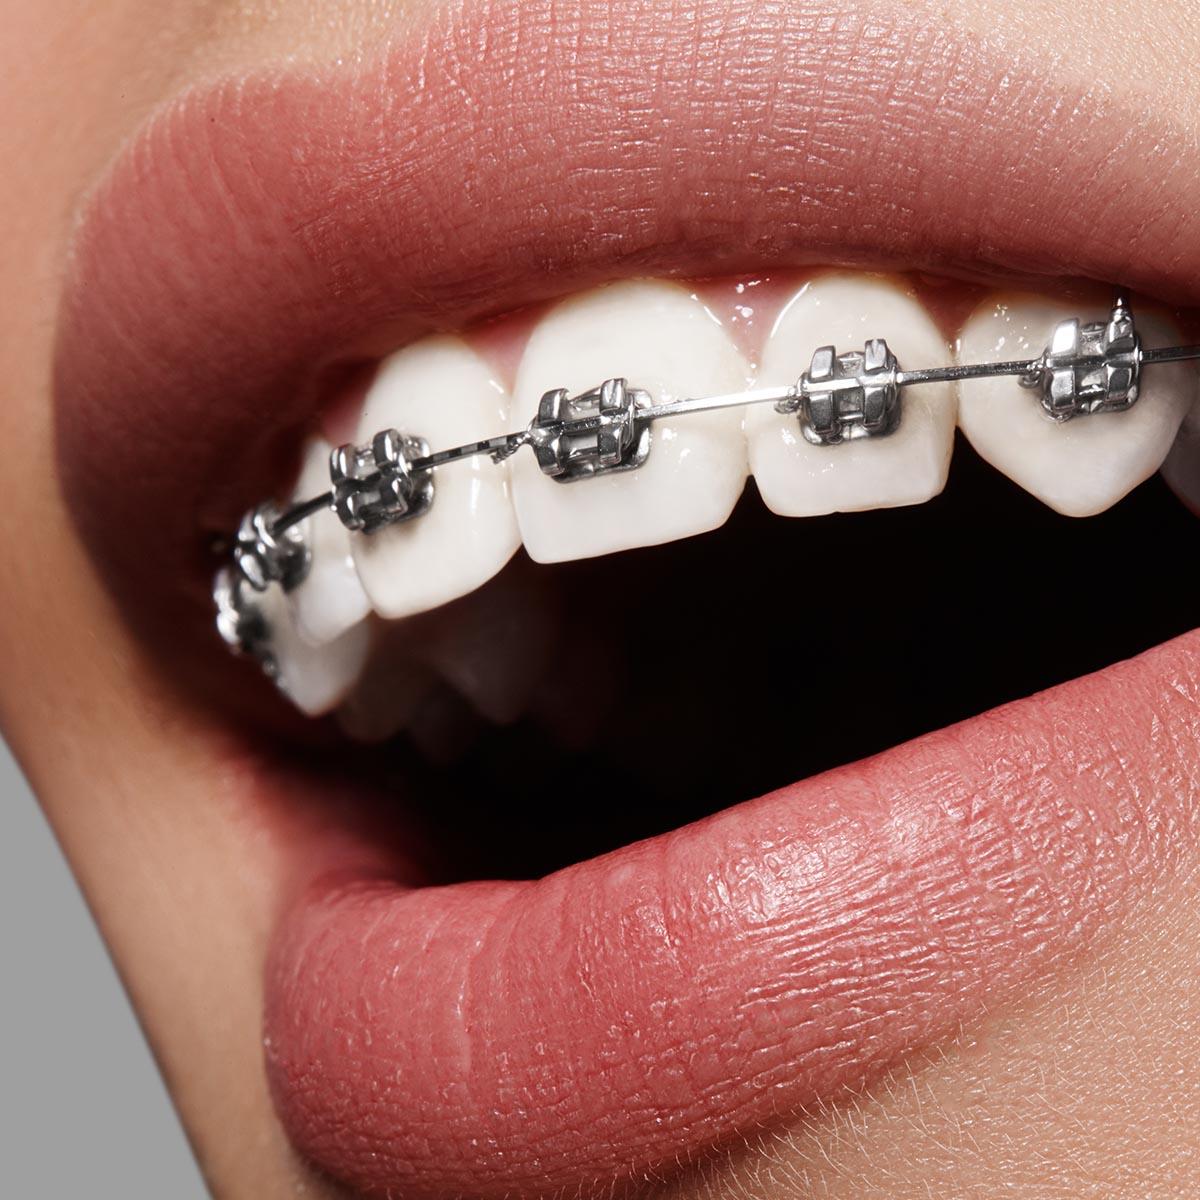 ortodontie oradea